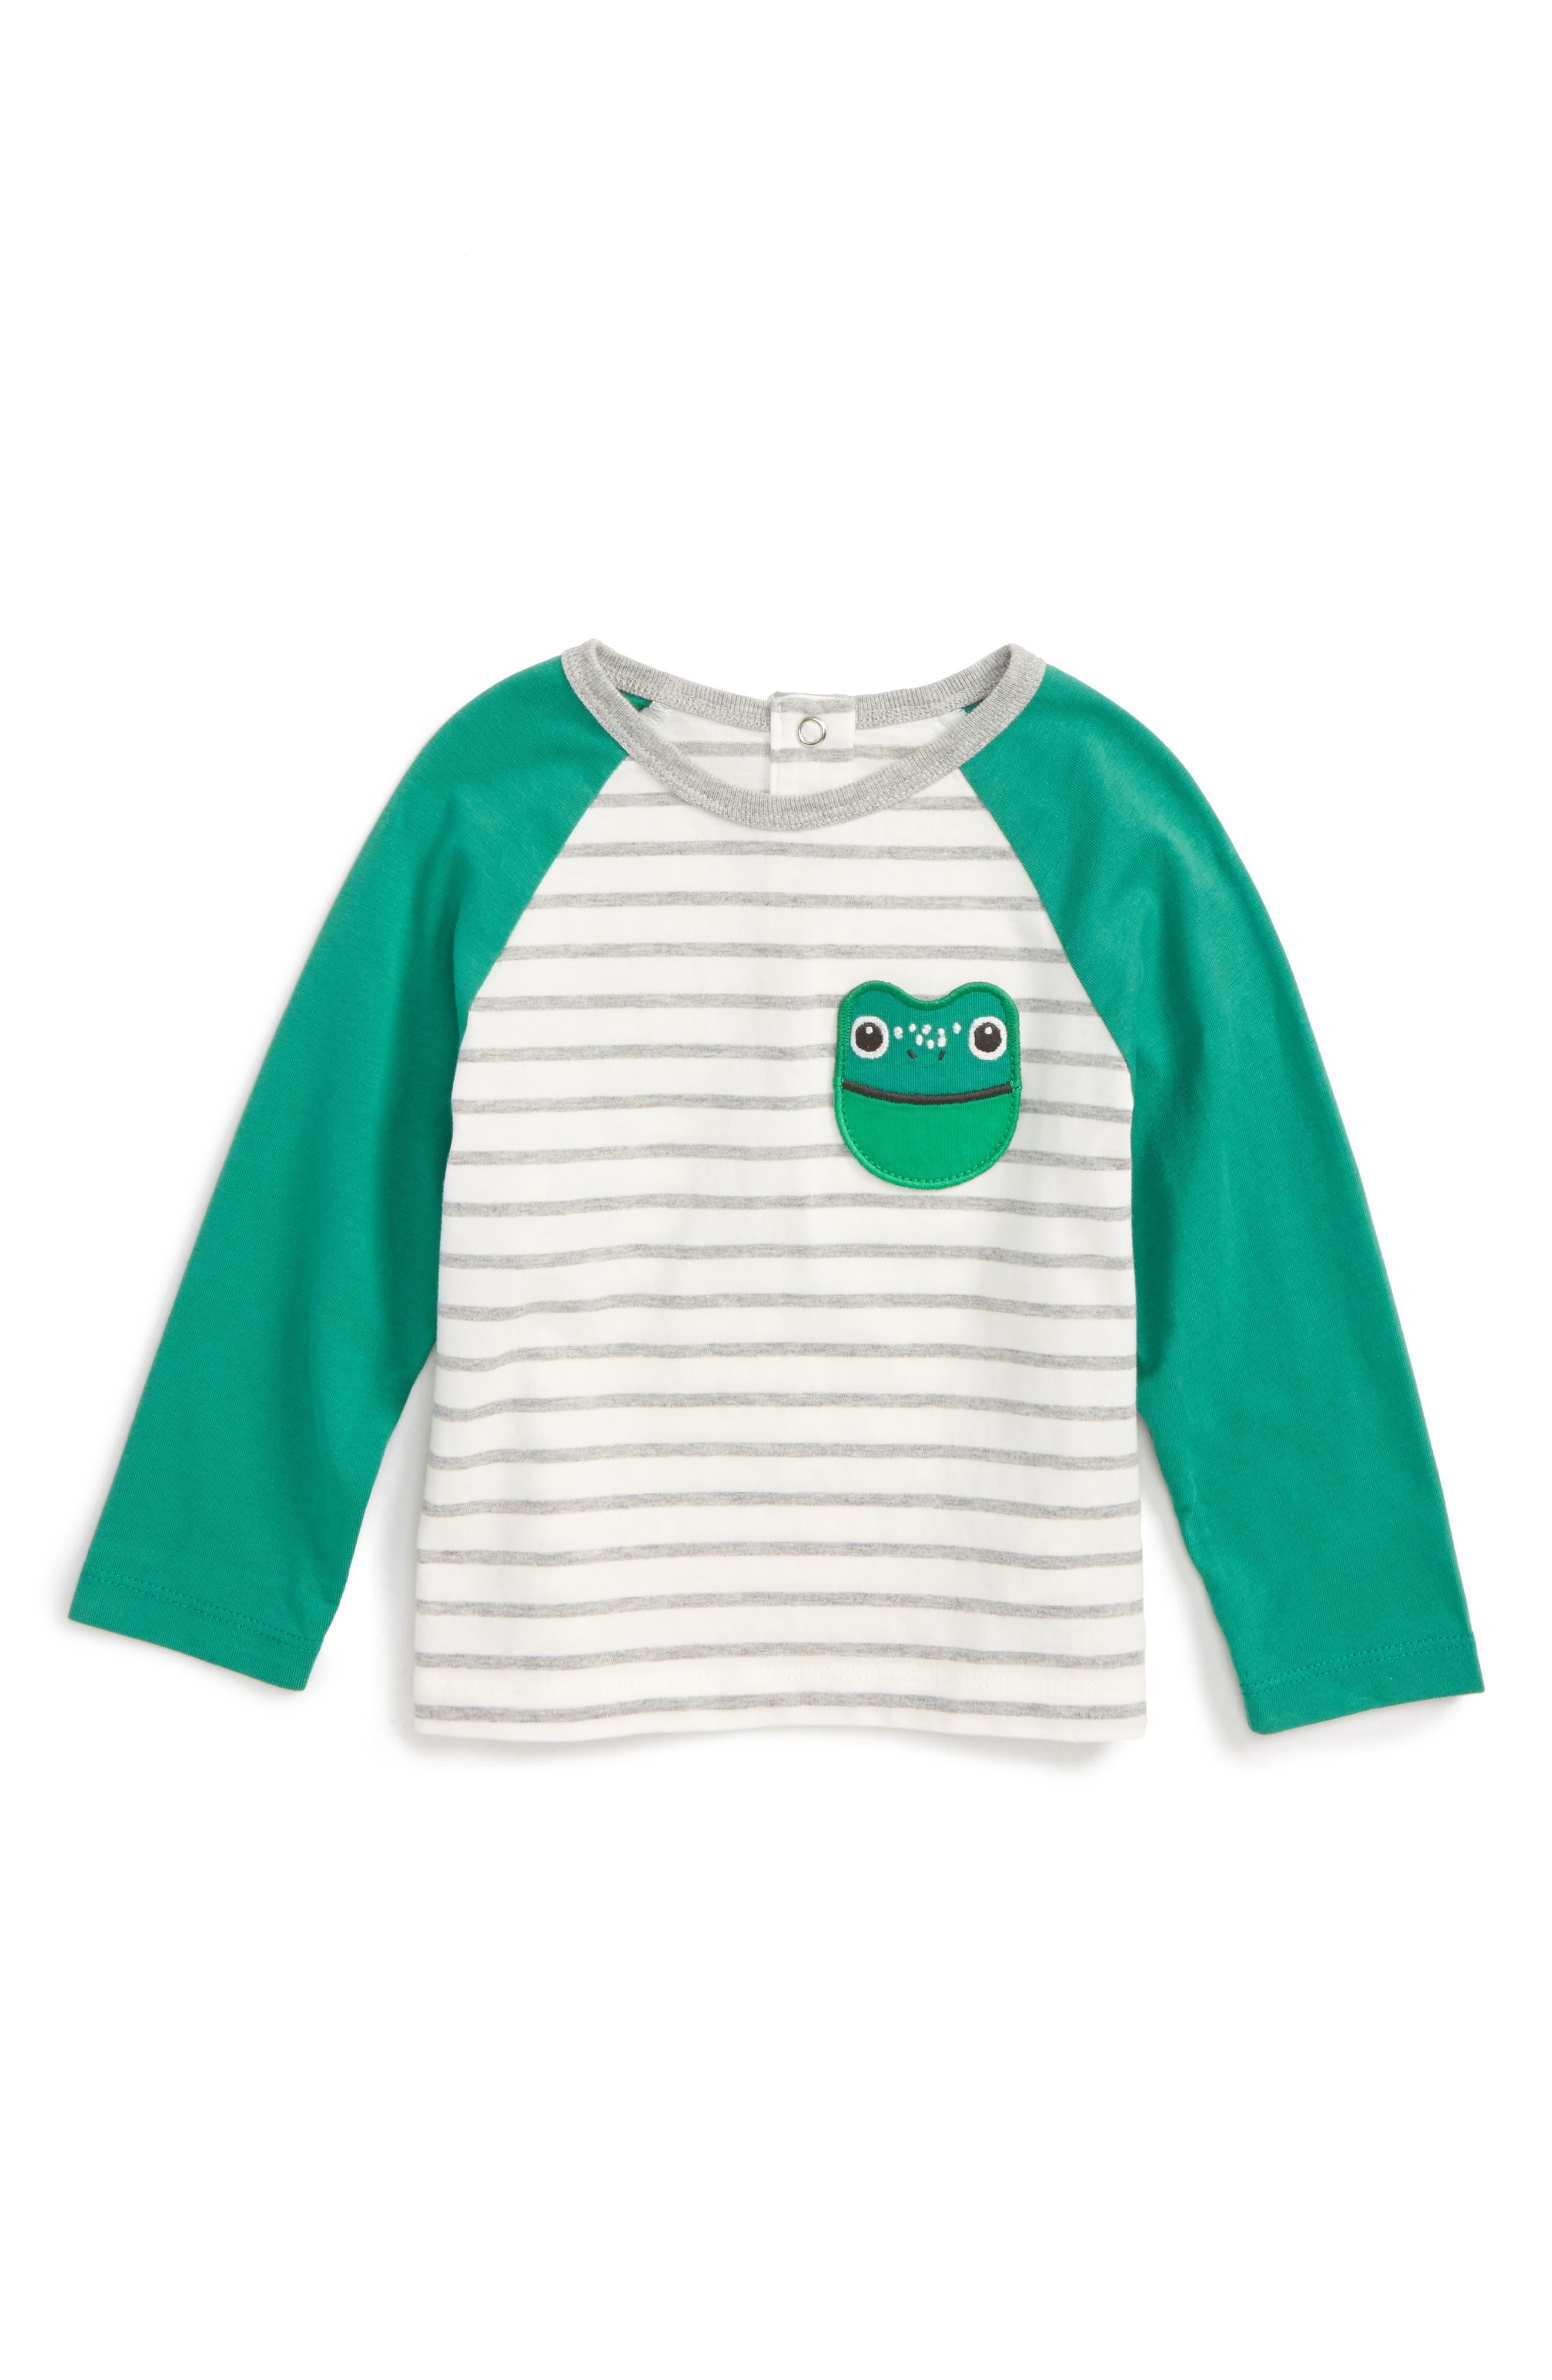 Pocket Pet T-Shirt,                         Main,                         color, 901